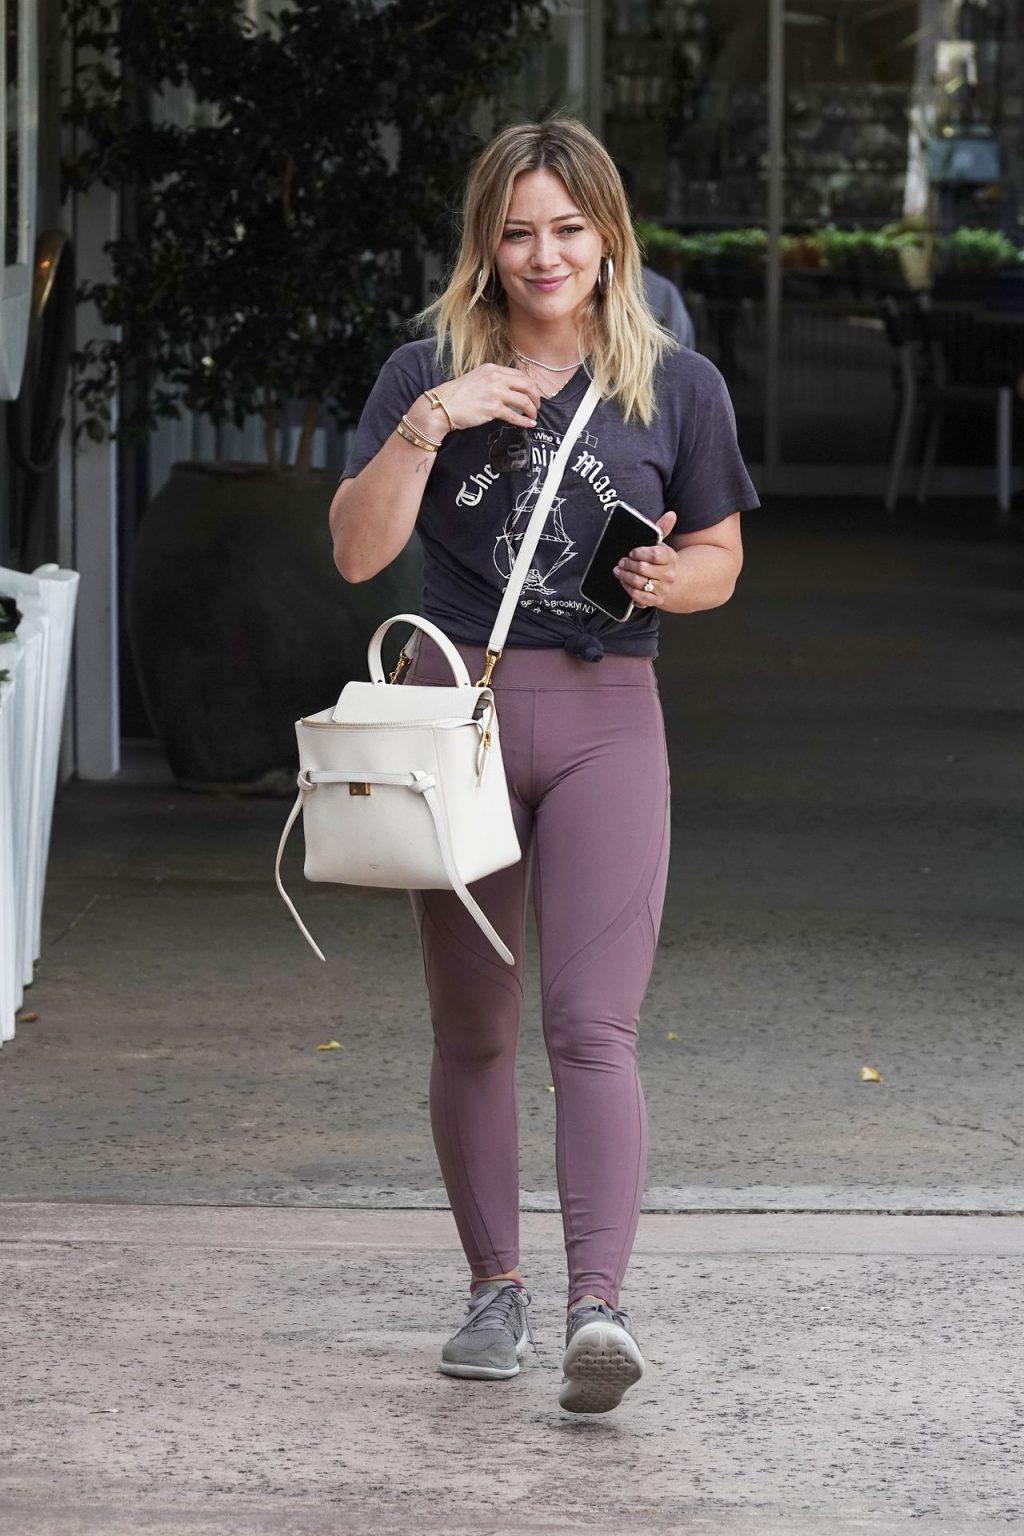 Hilary Duff Cameltoe